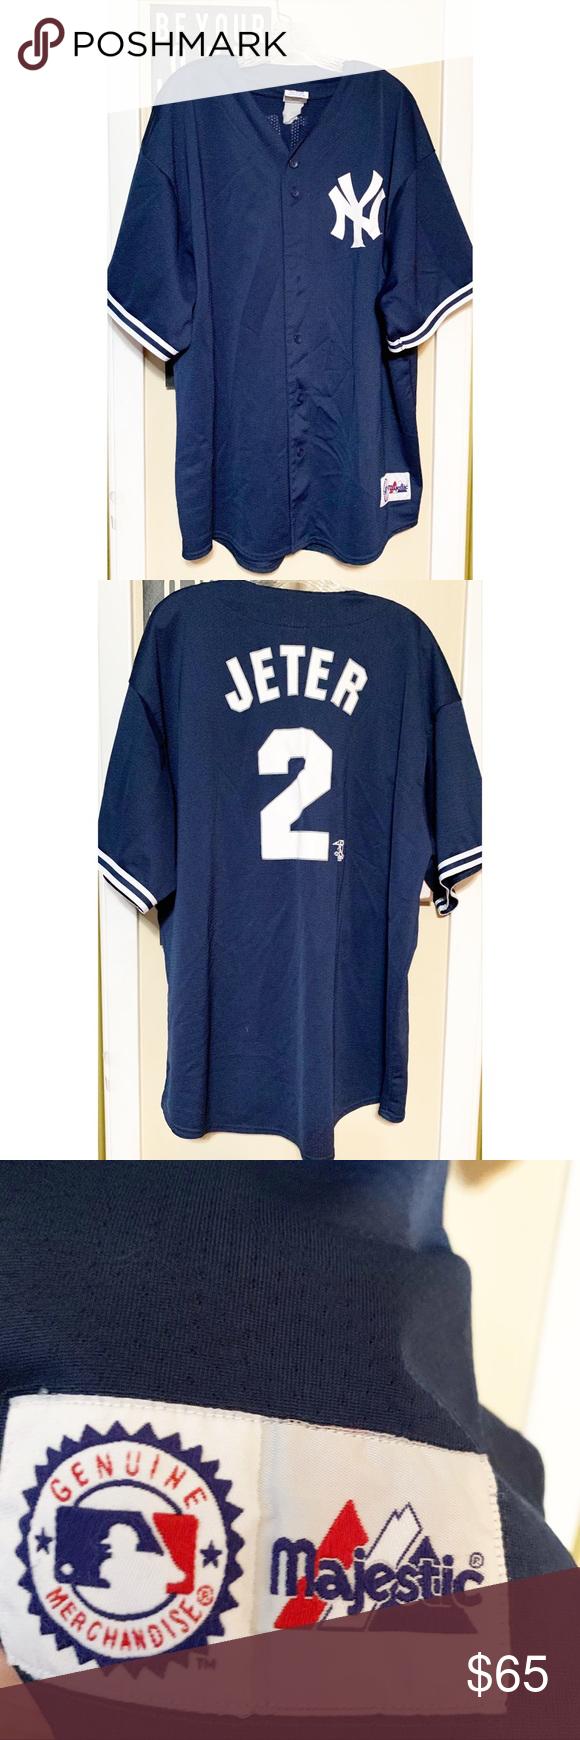 detailed look d7331 ac7b4 New York Yankees Derek Jeter #2 MLB Jersey -Throwback Derek ...